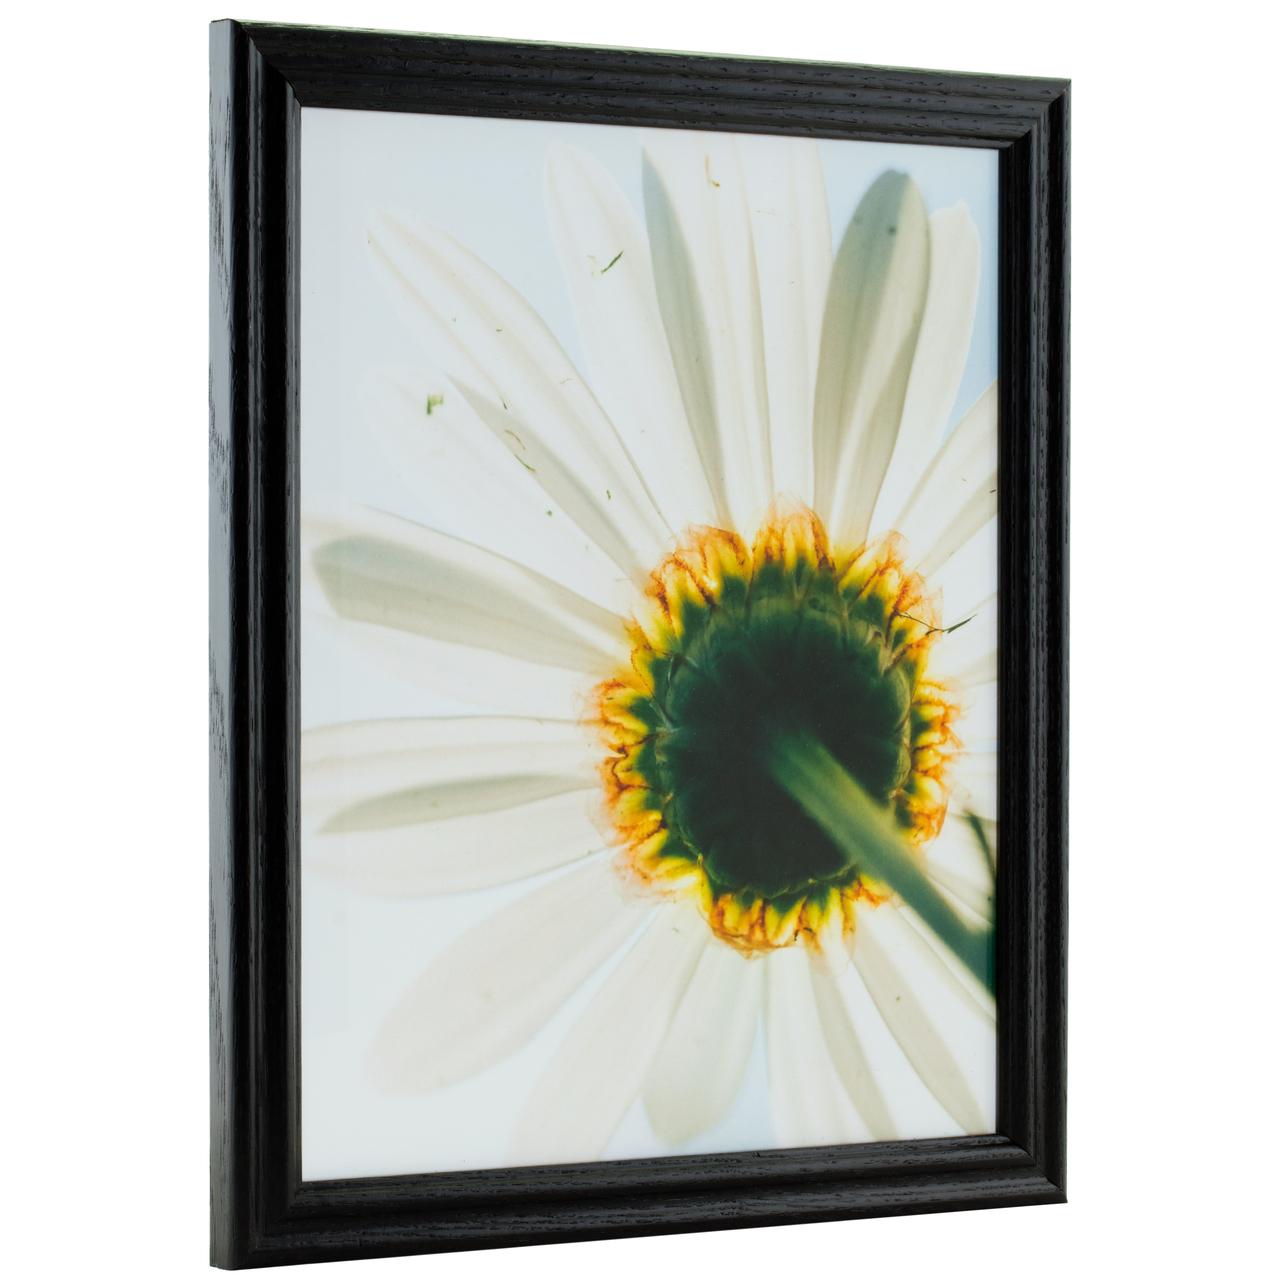 Traditional frame design ideal for a wide range of prints.